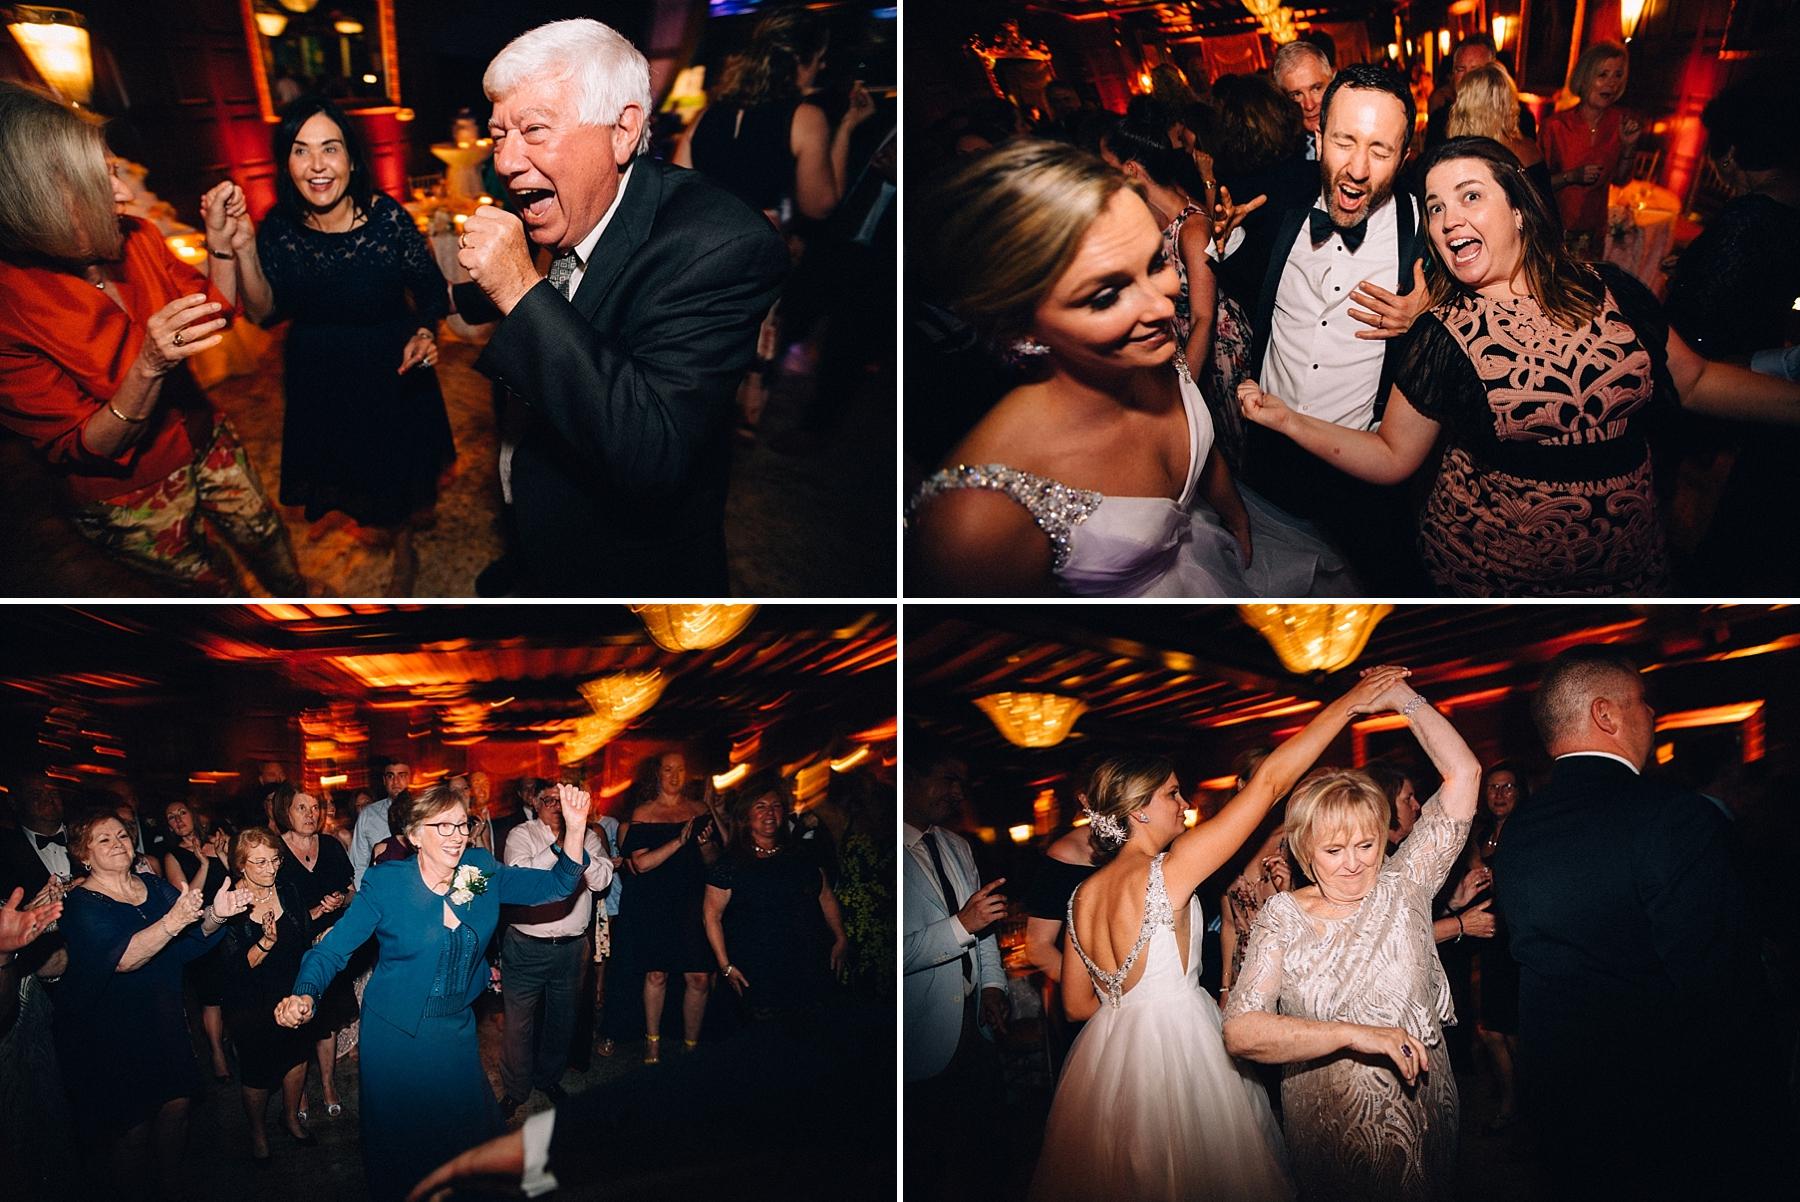 shadow_brook_nj_wedding_photographer_monmouth_county_0032.jpg